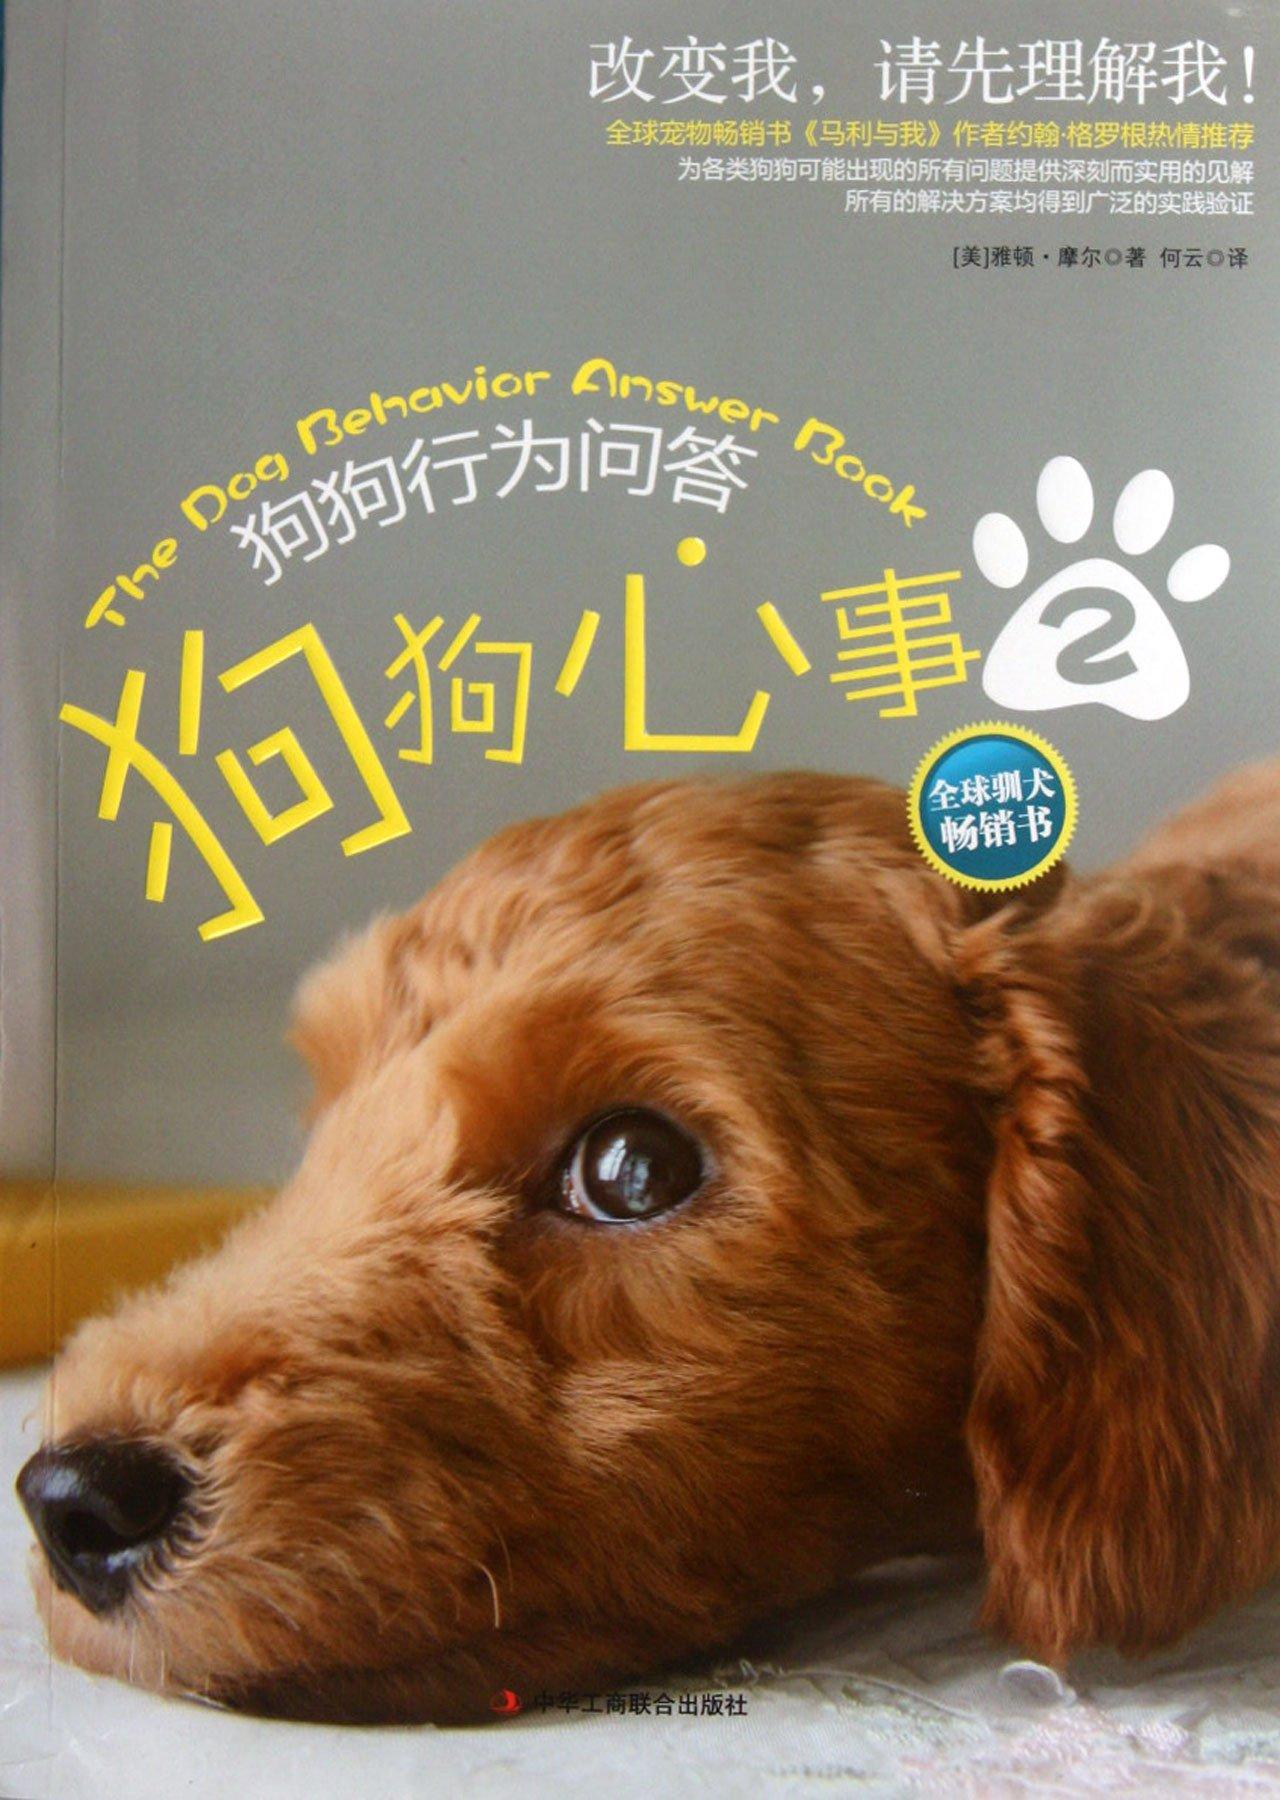 Dogs mind - dog behavior Q&A -2 (Chinese Edition) PDF